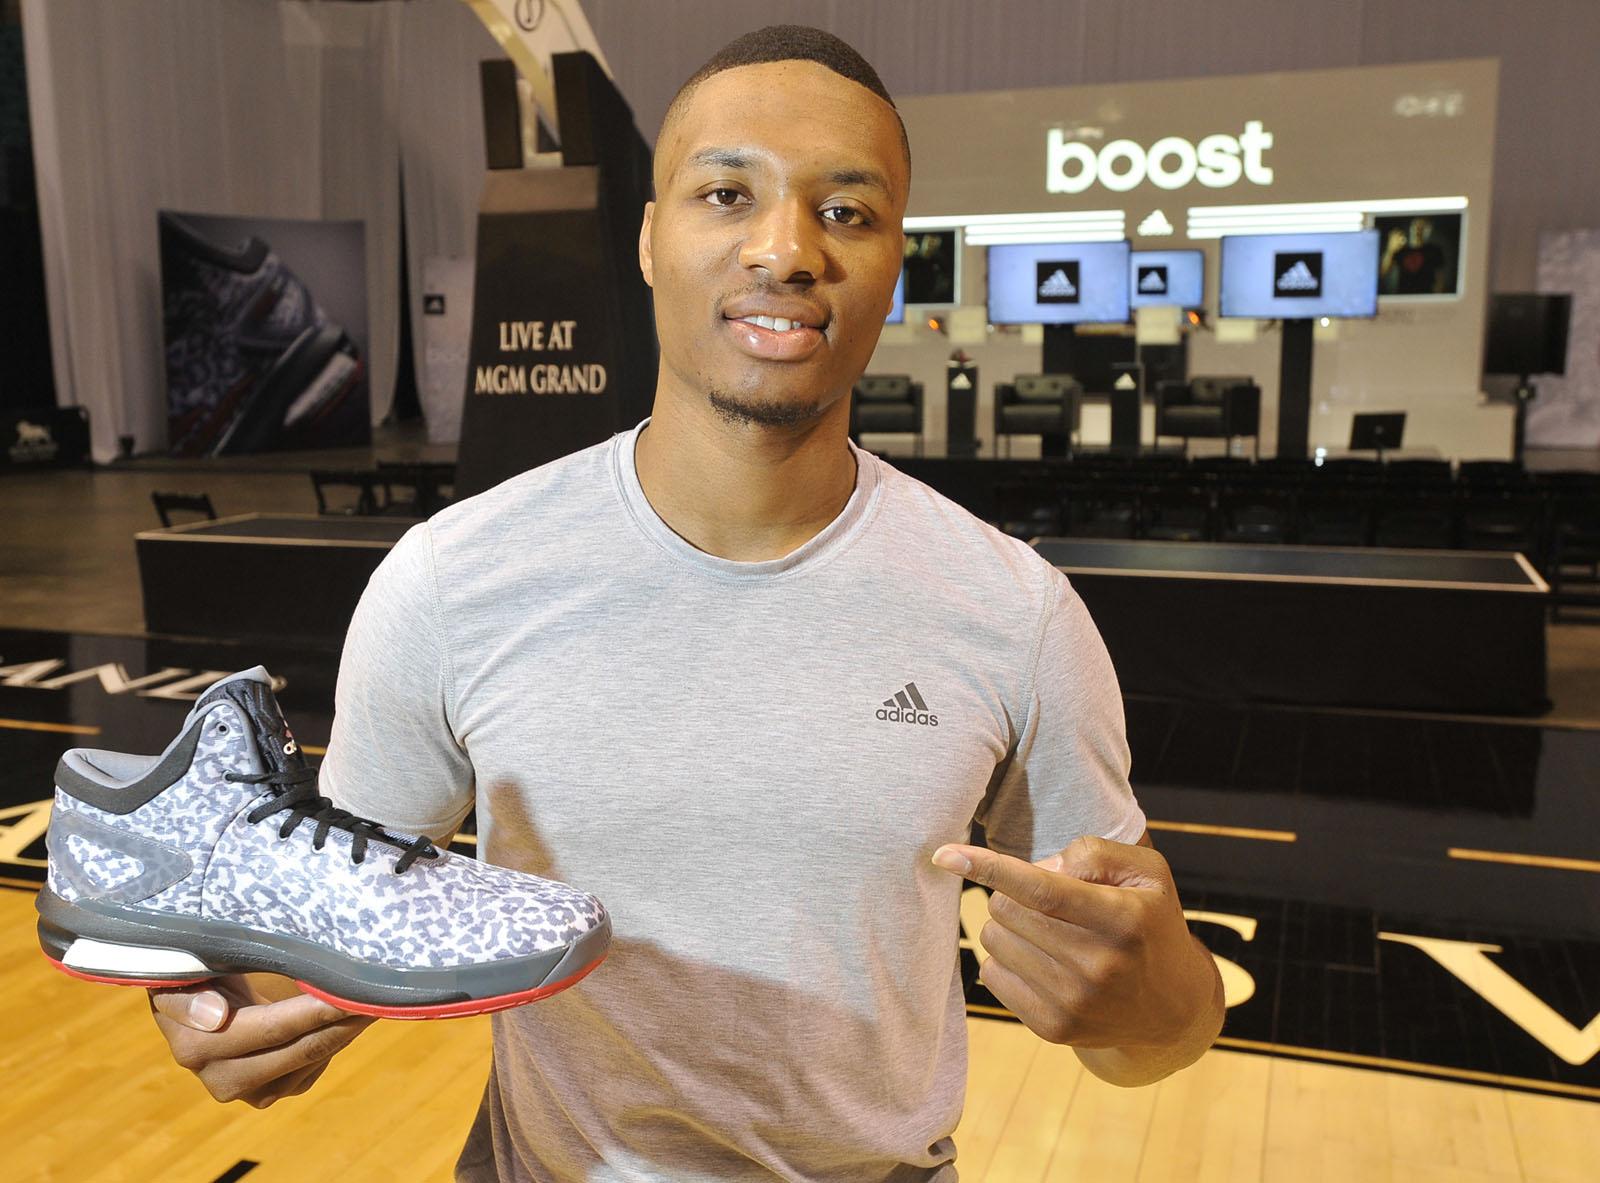 sports shoes 4964d 8b0b5 Damianlillardcrazylightboost1medium. Lillard ...